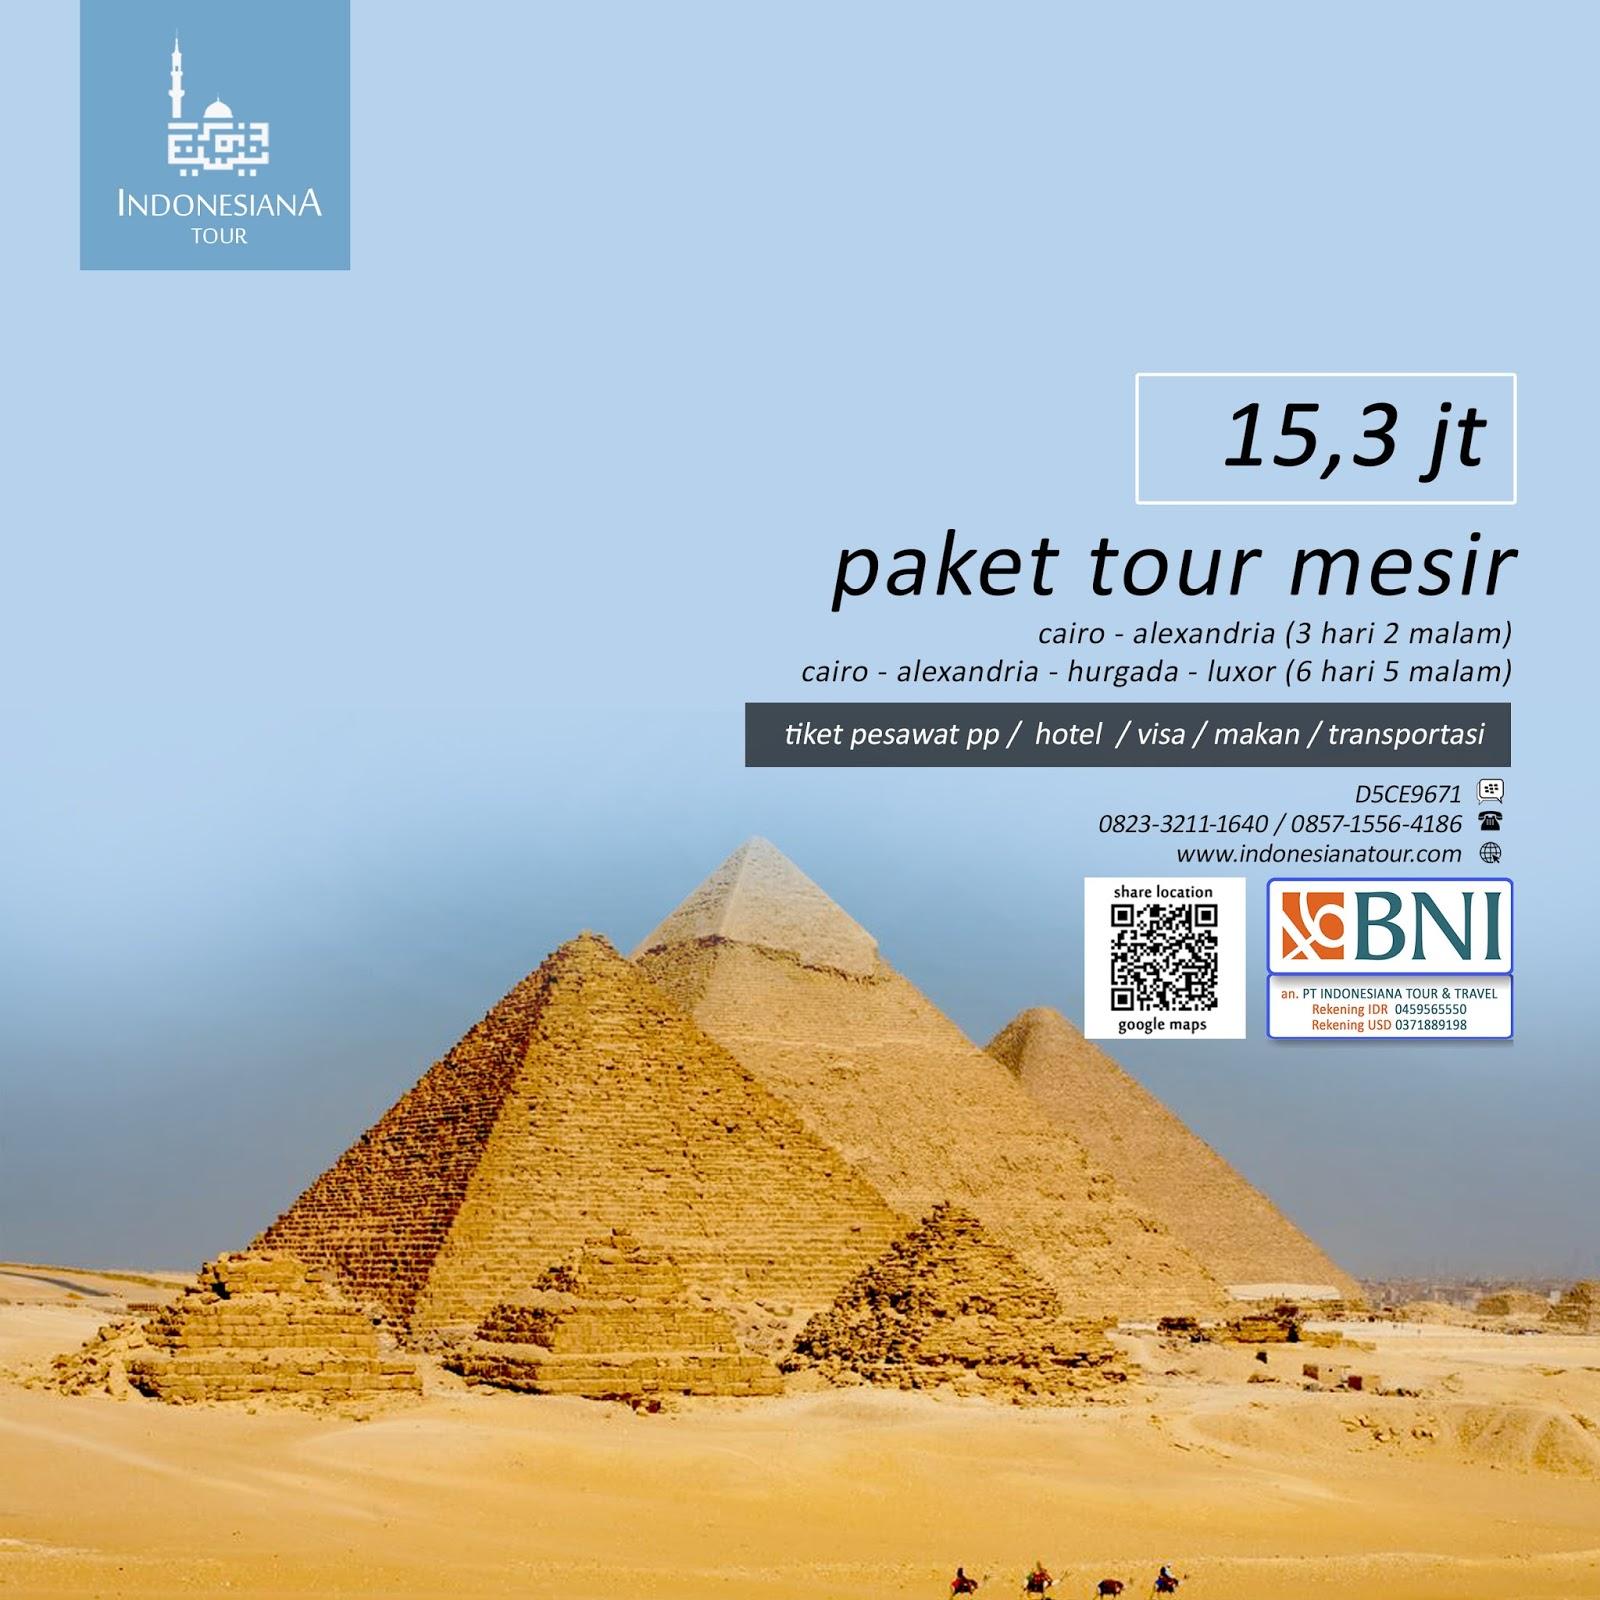 Paket Wisata Tour Mesir INDONESIANA TOUR